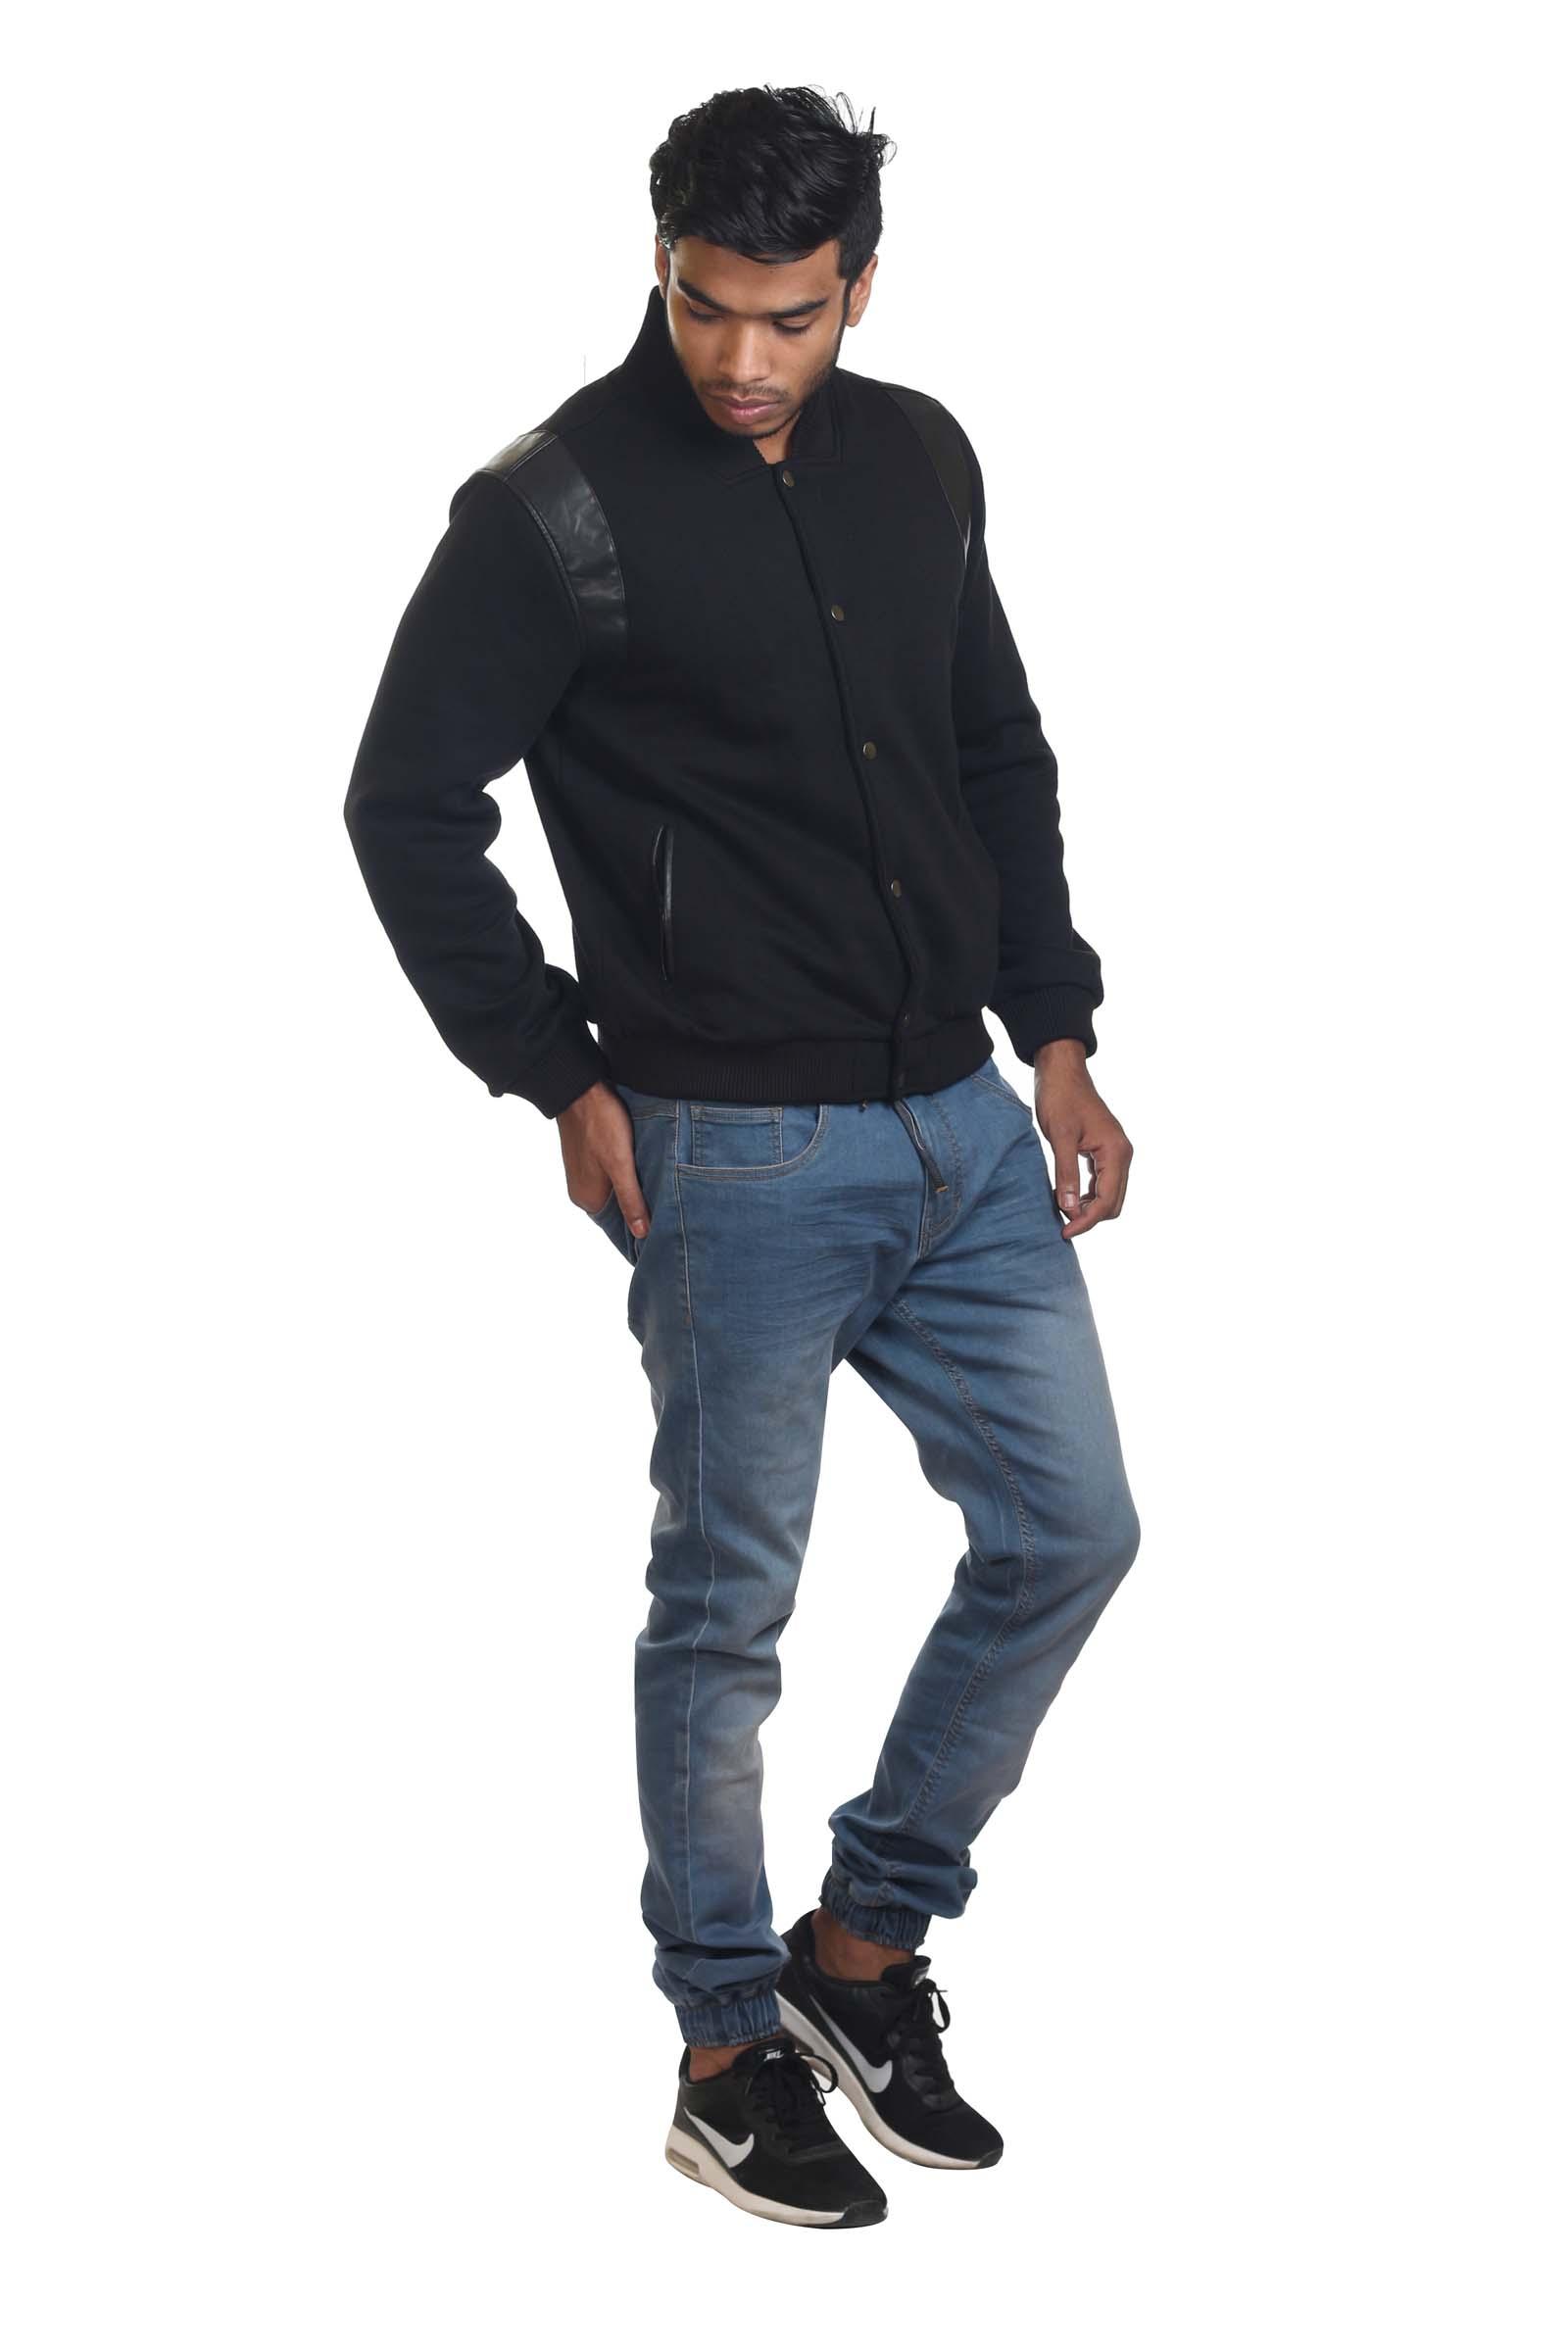 Cotton-Blend Bomber Jacket